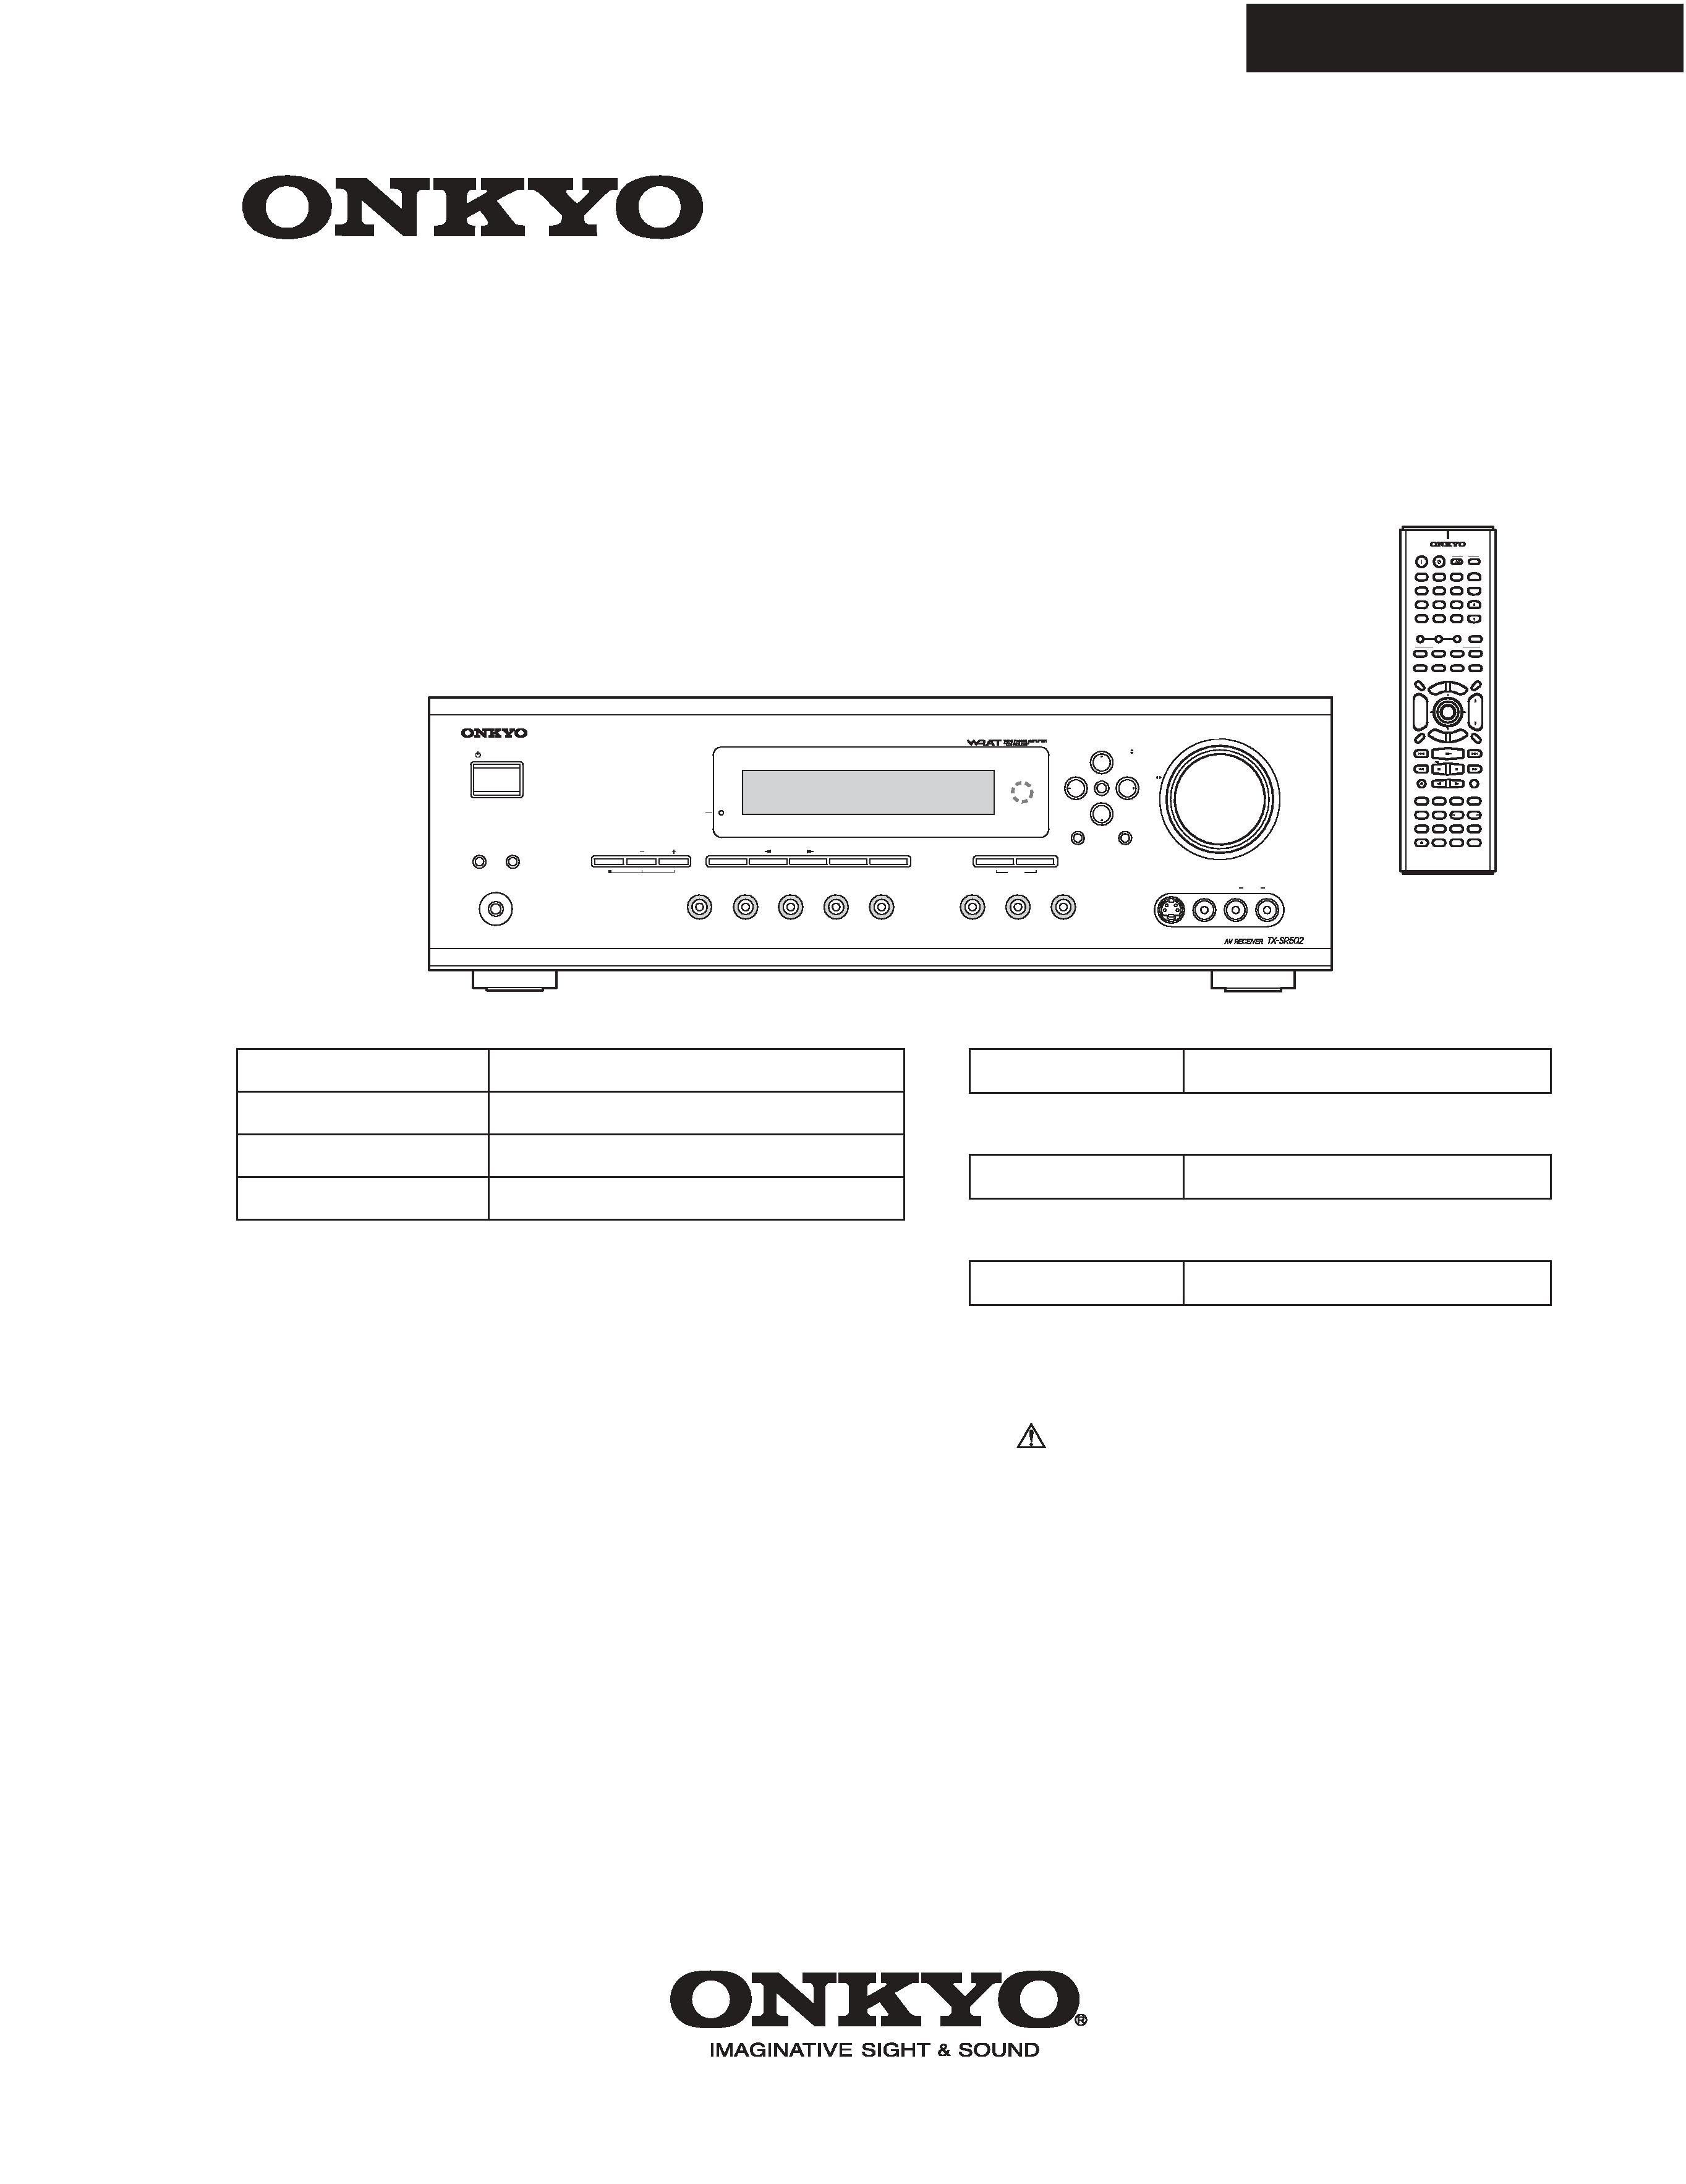 Service Manual For Onkyo Tx-sr502